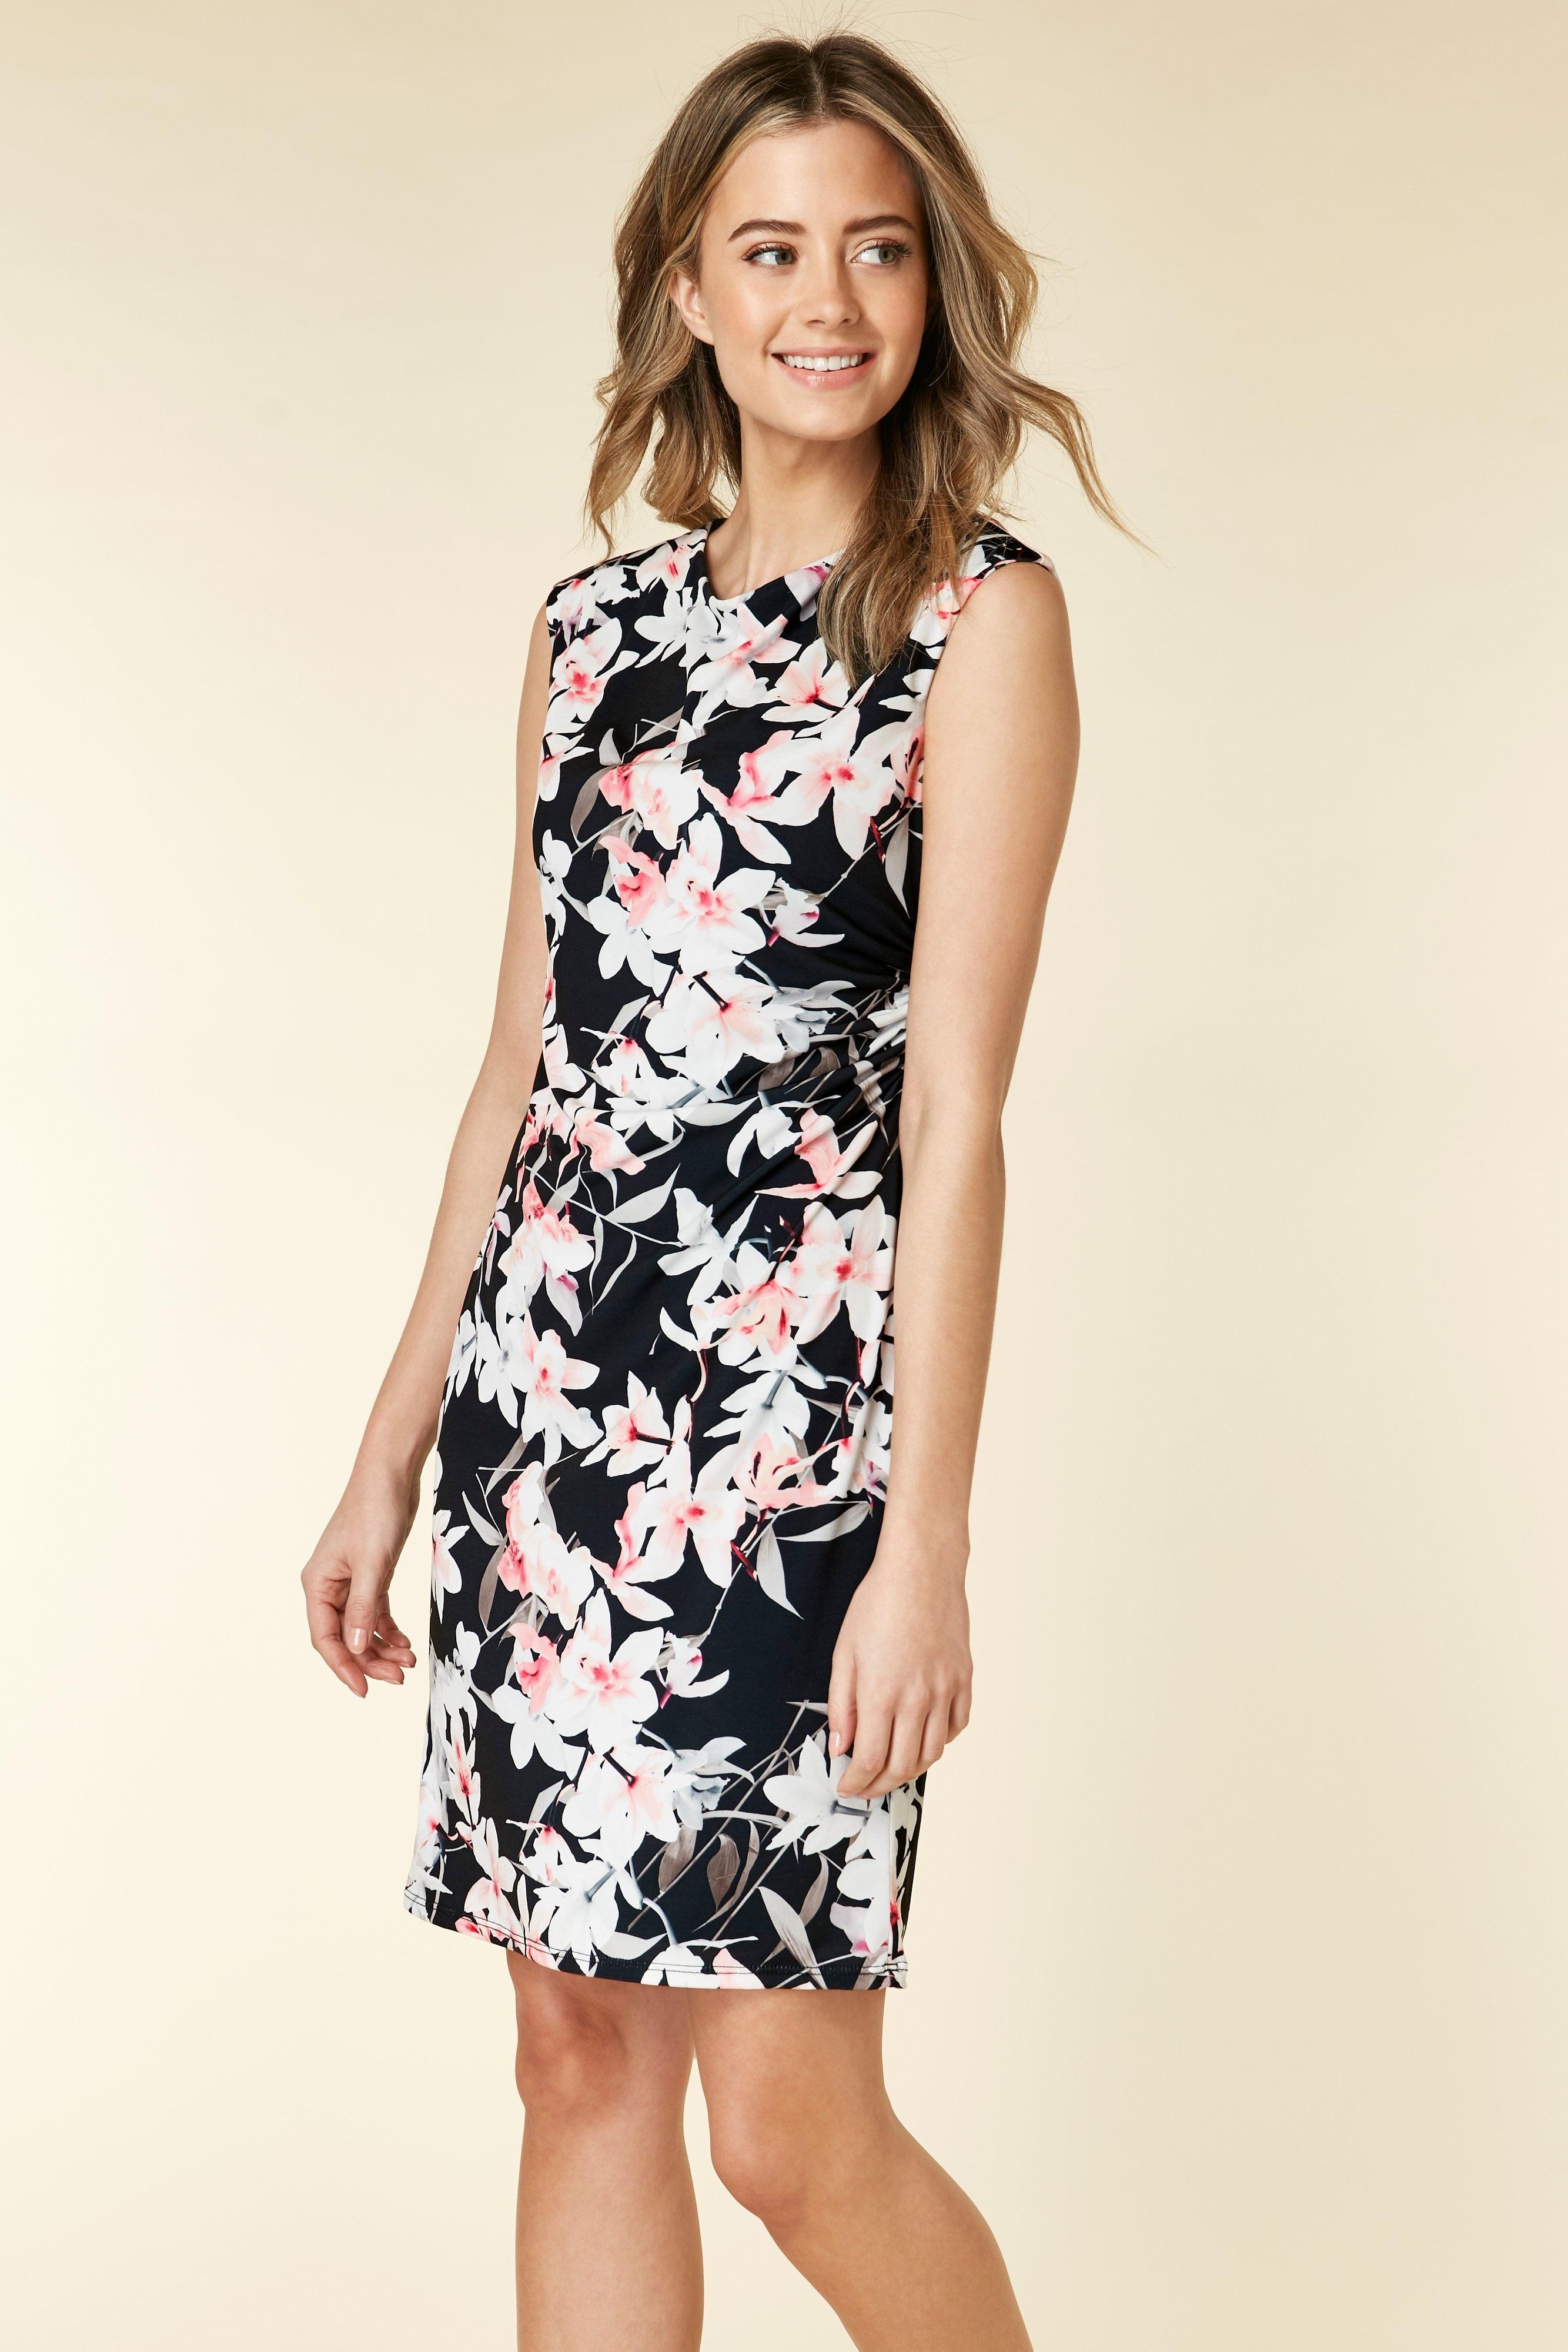 175b976c28bdbb Wallis - Petite Black Floral Print Shift Dress - Lyst. View fullscreen